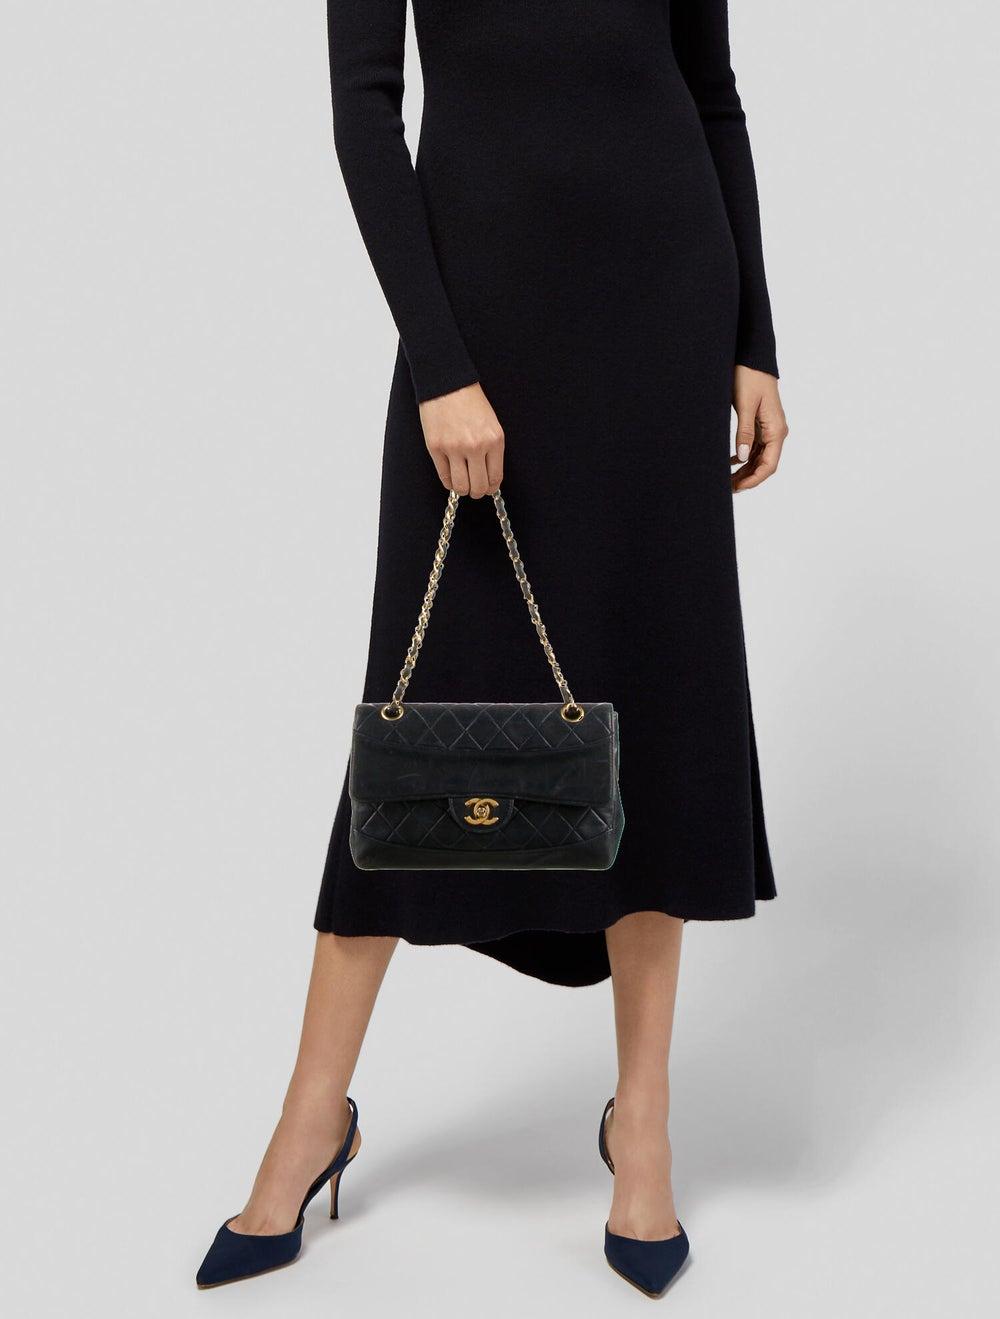 Chanel Vintage Quilted Flap Bag Blue - image 2